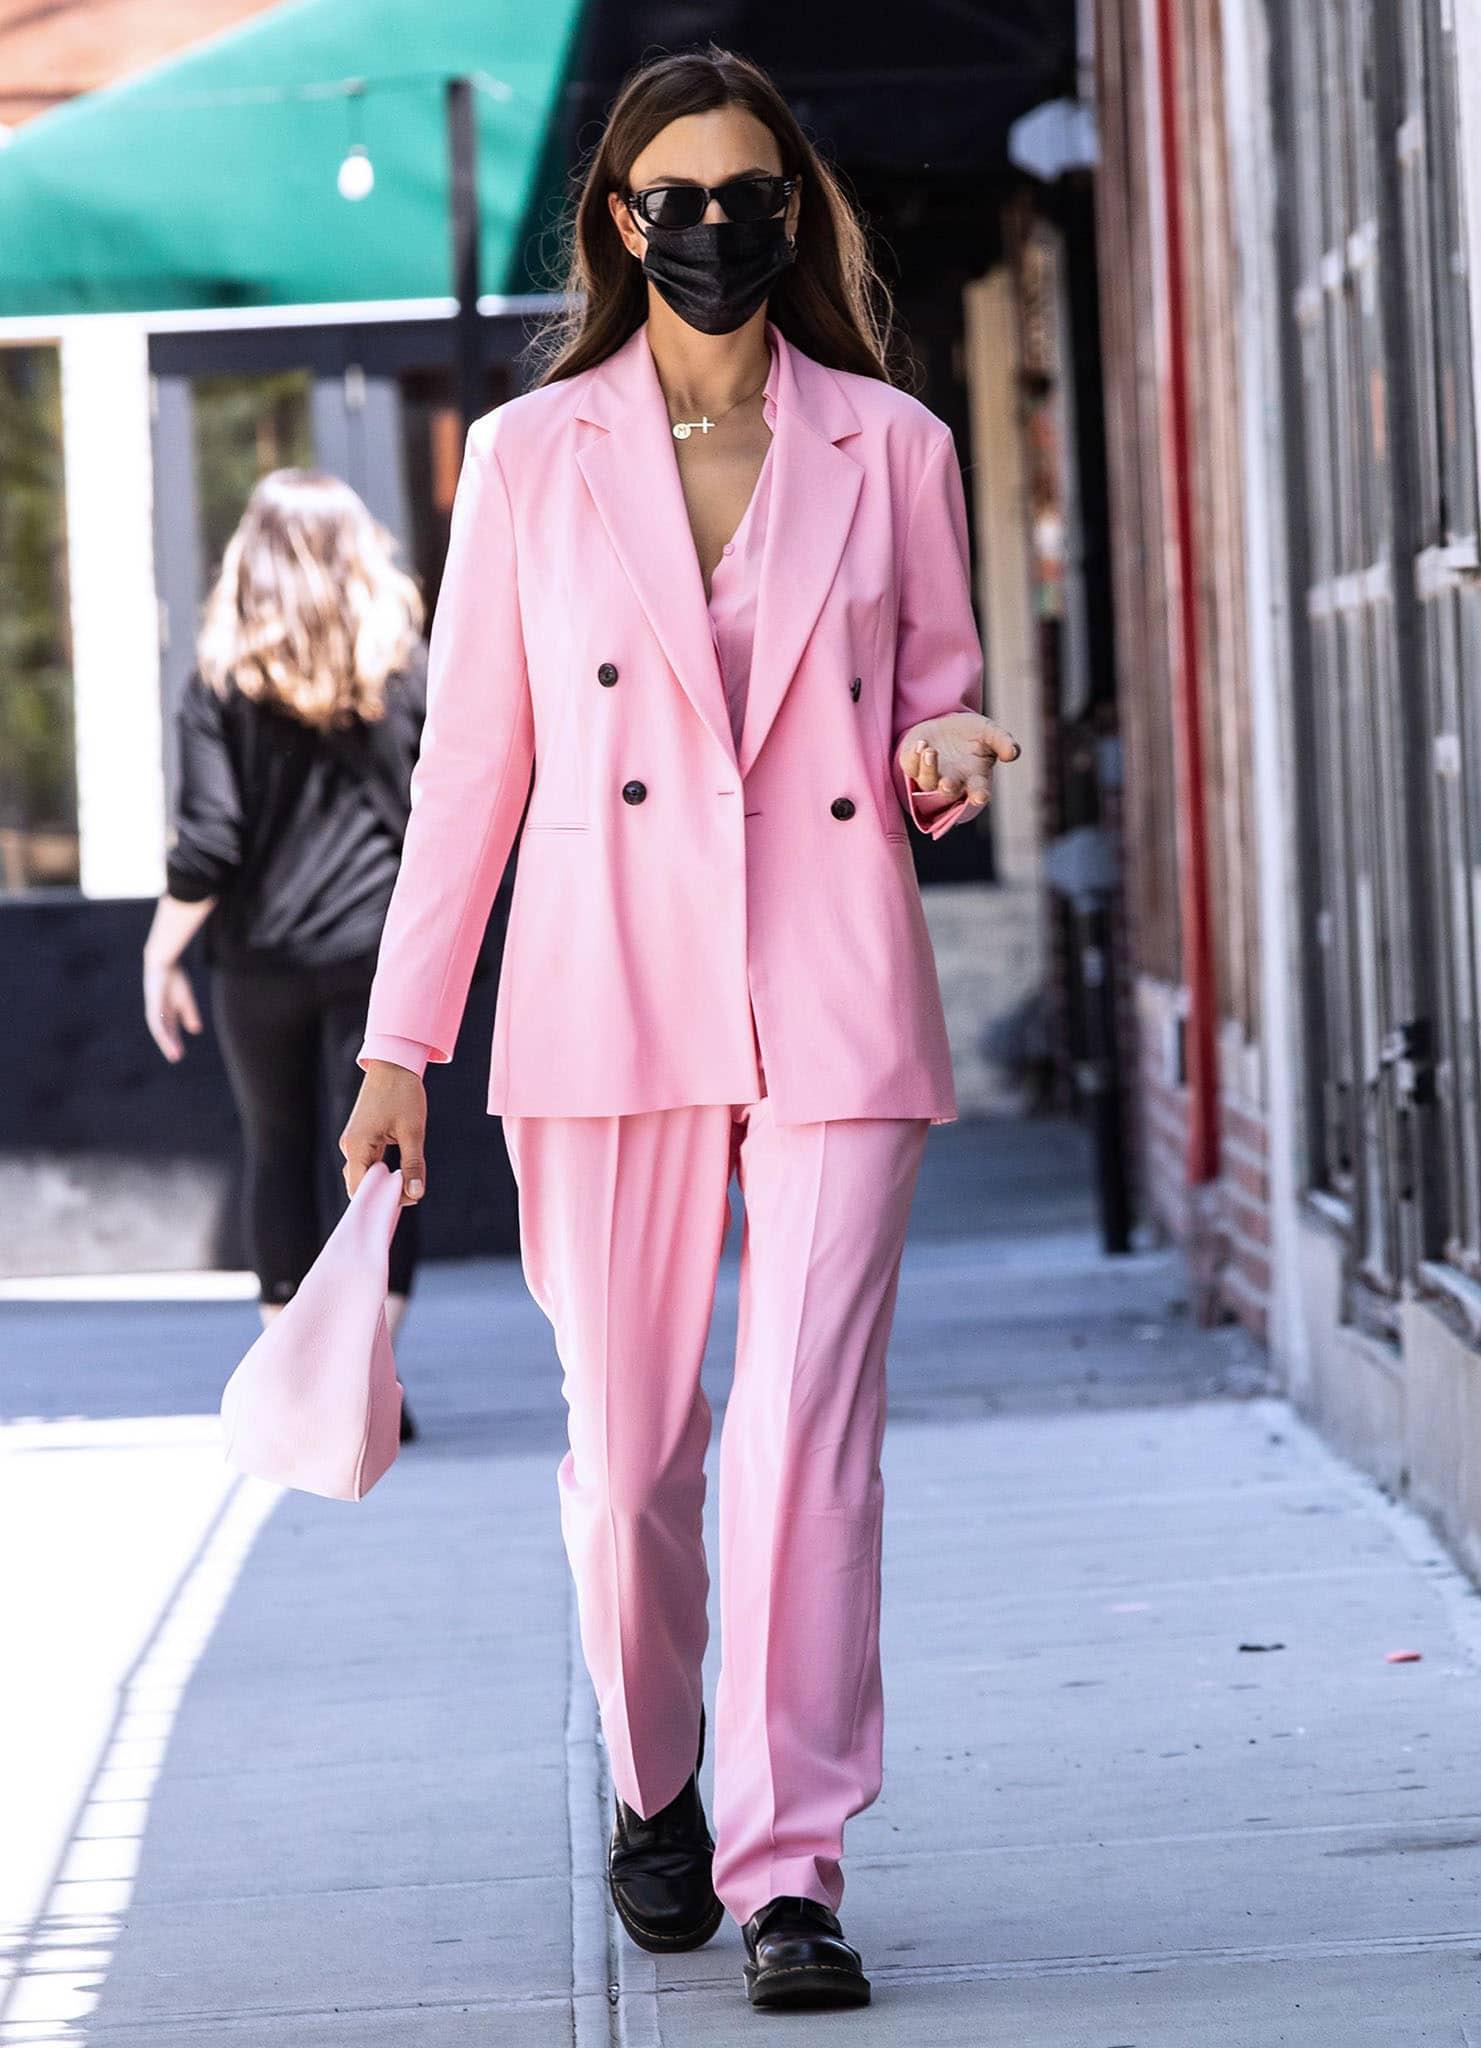 Irina Shayk wears a spring chic bubblegum pink suit from Hugo Boss